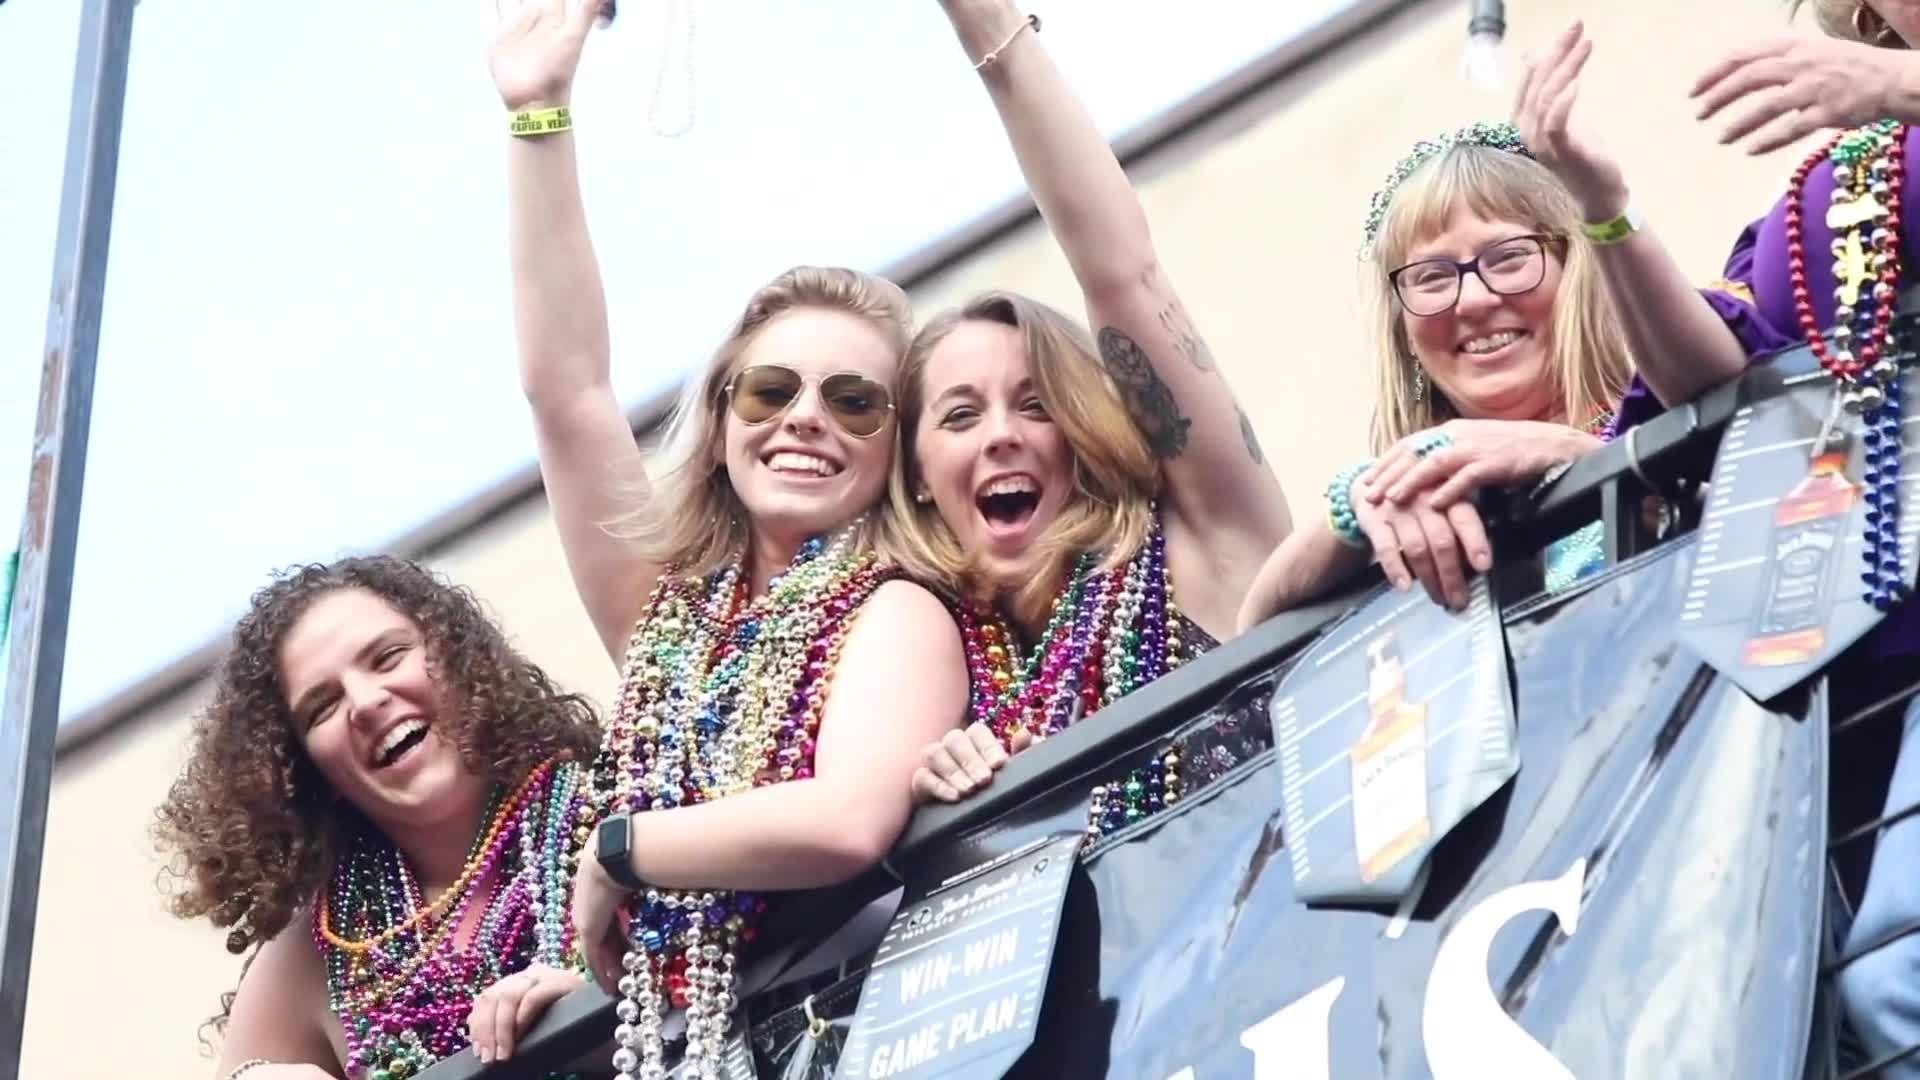 GCCW's Mardi Gras 2019 in Mobile & Pensacola